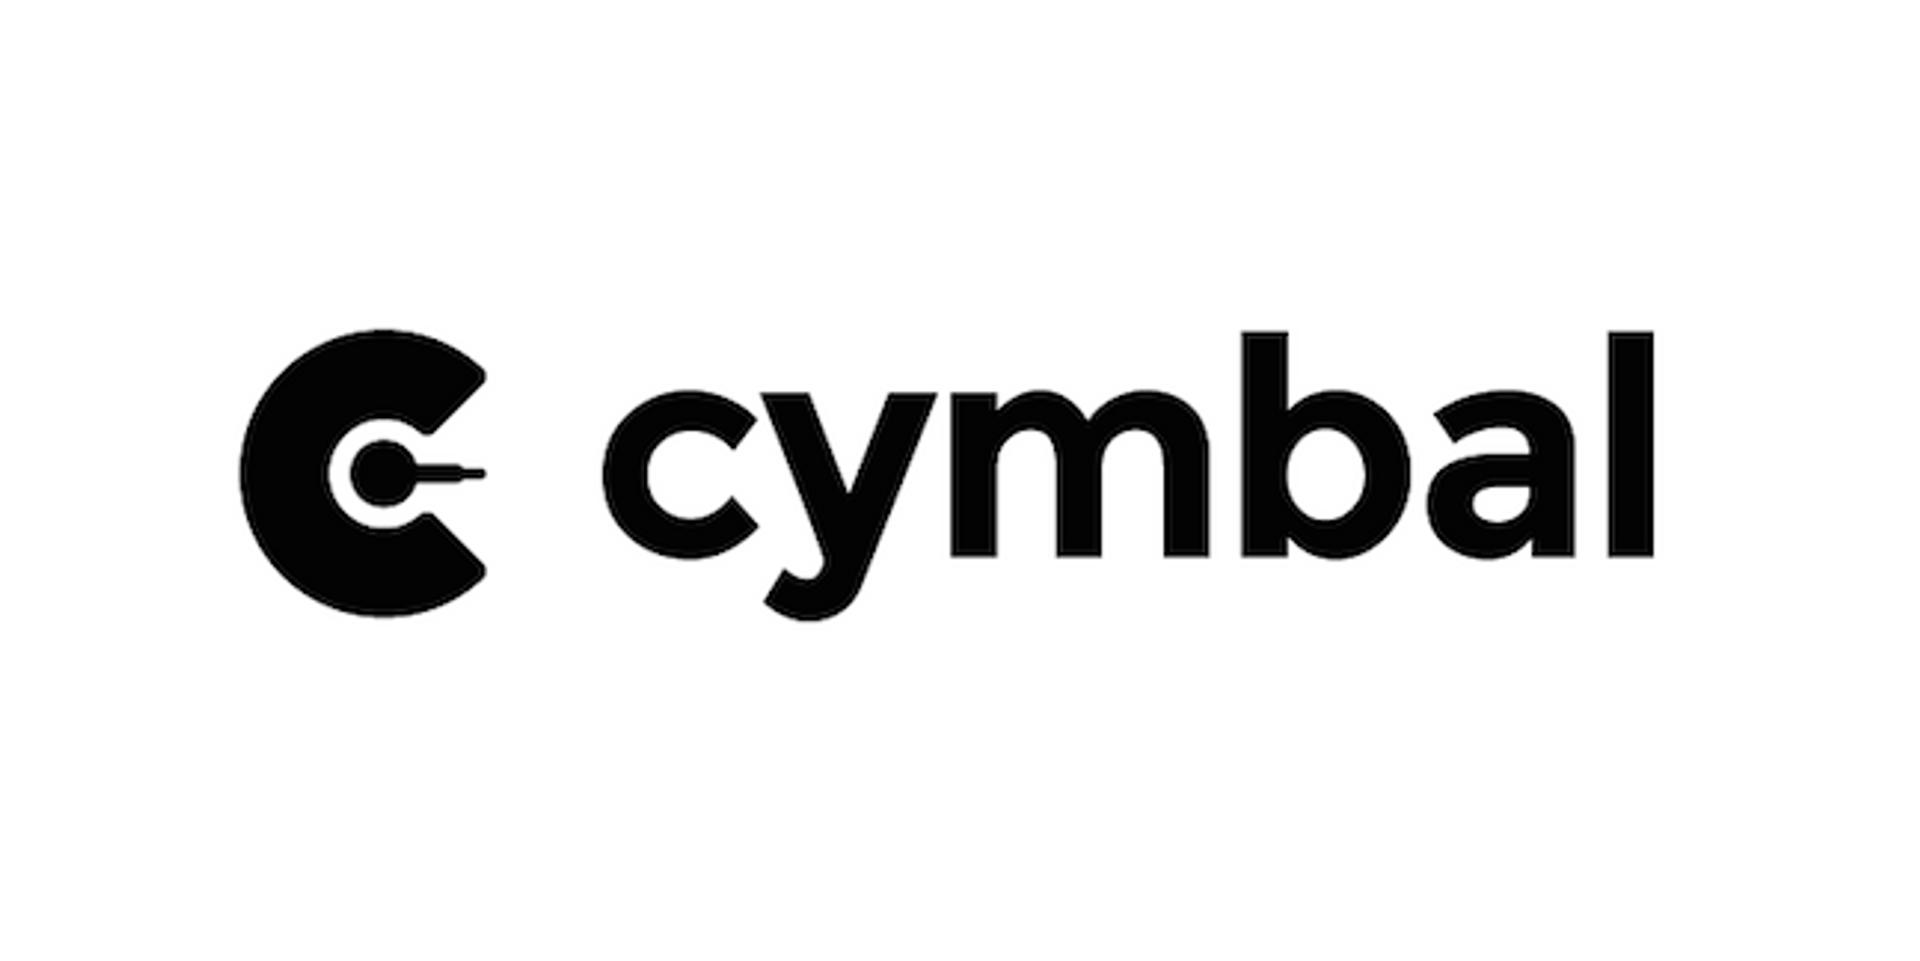 Social music platform Cymbal is shutting down